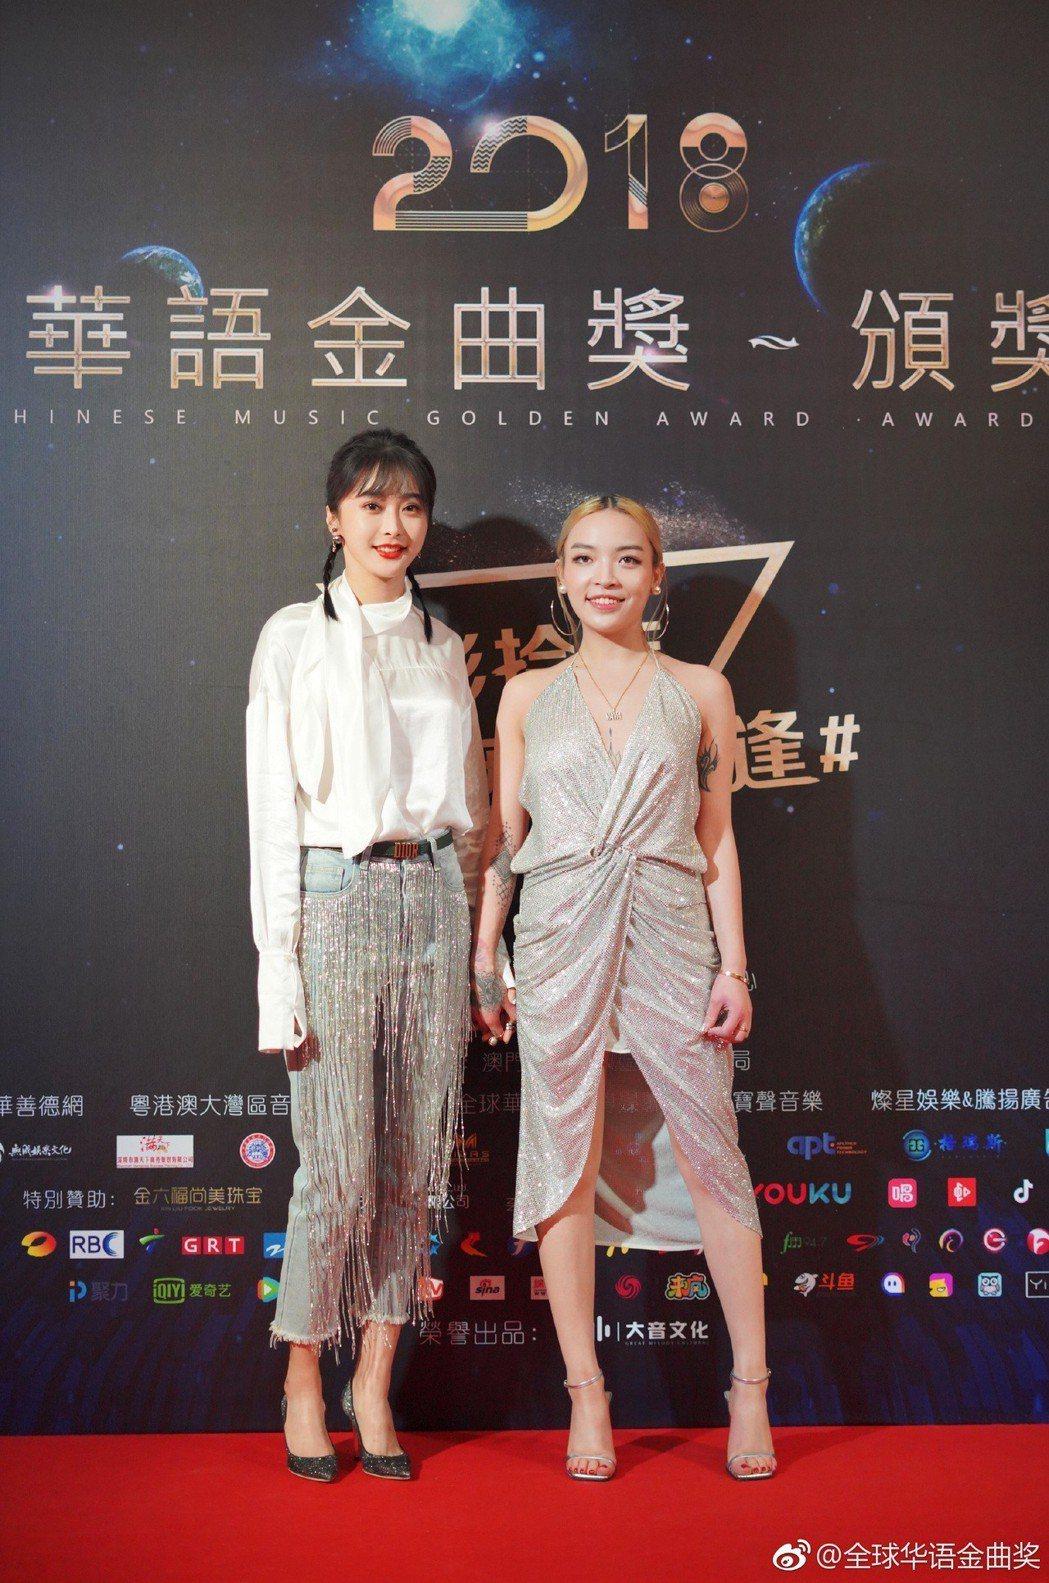 VaVa(右)出席2018全球華語金曲獎典禮。 圖/擷自微博